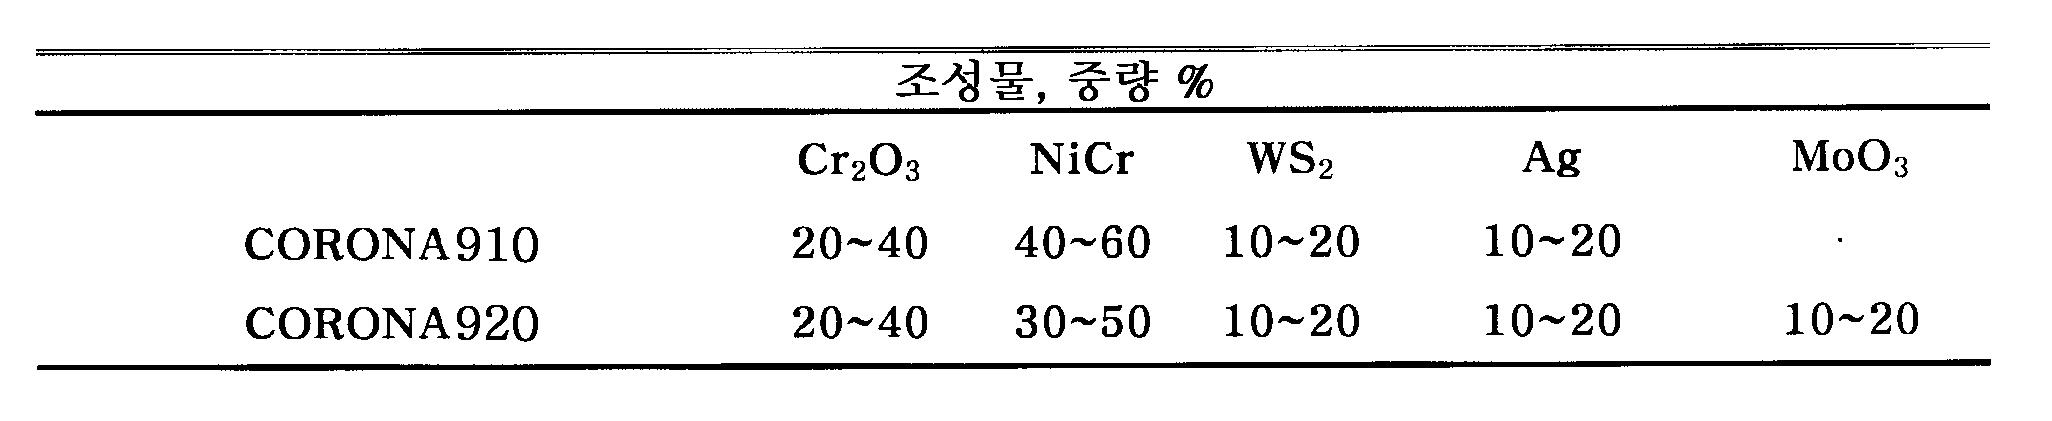 Figure 112005036055873-pat00001